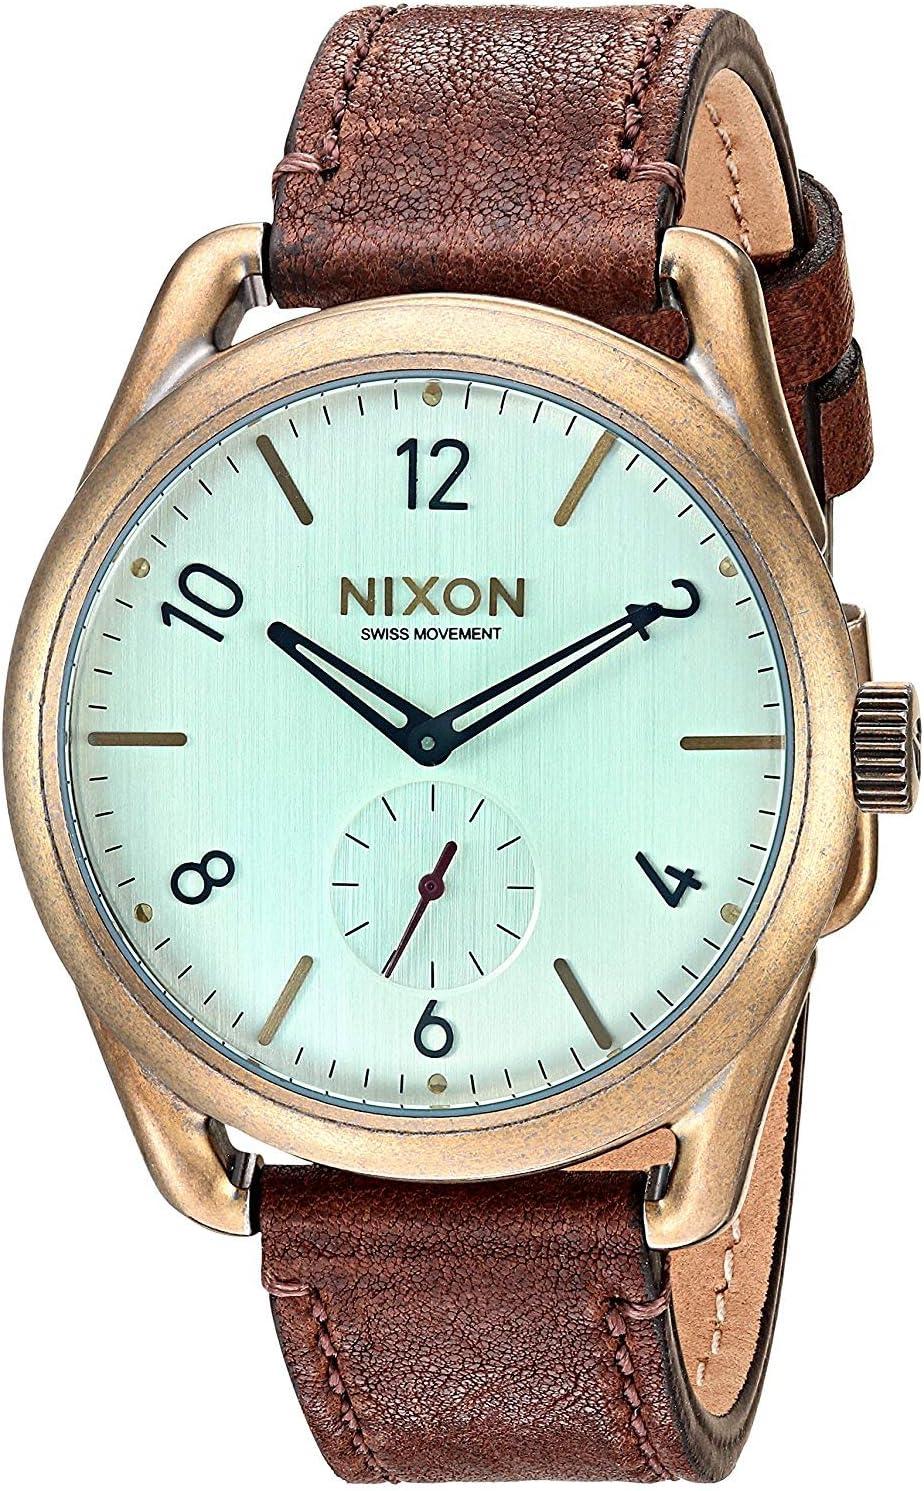 Nixon C39 Leather -Spring 2017- Brass/Green Crystal/Brown